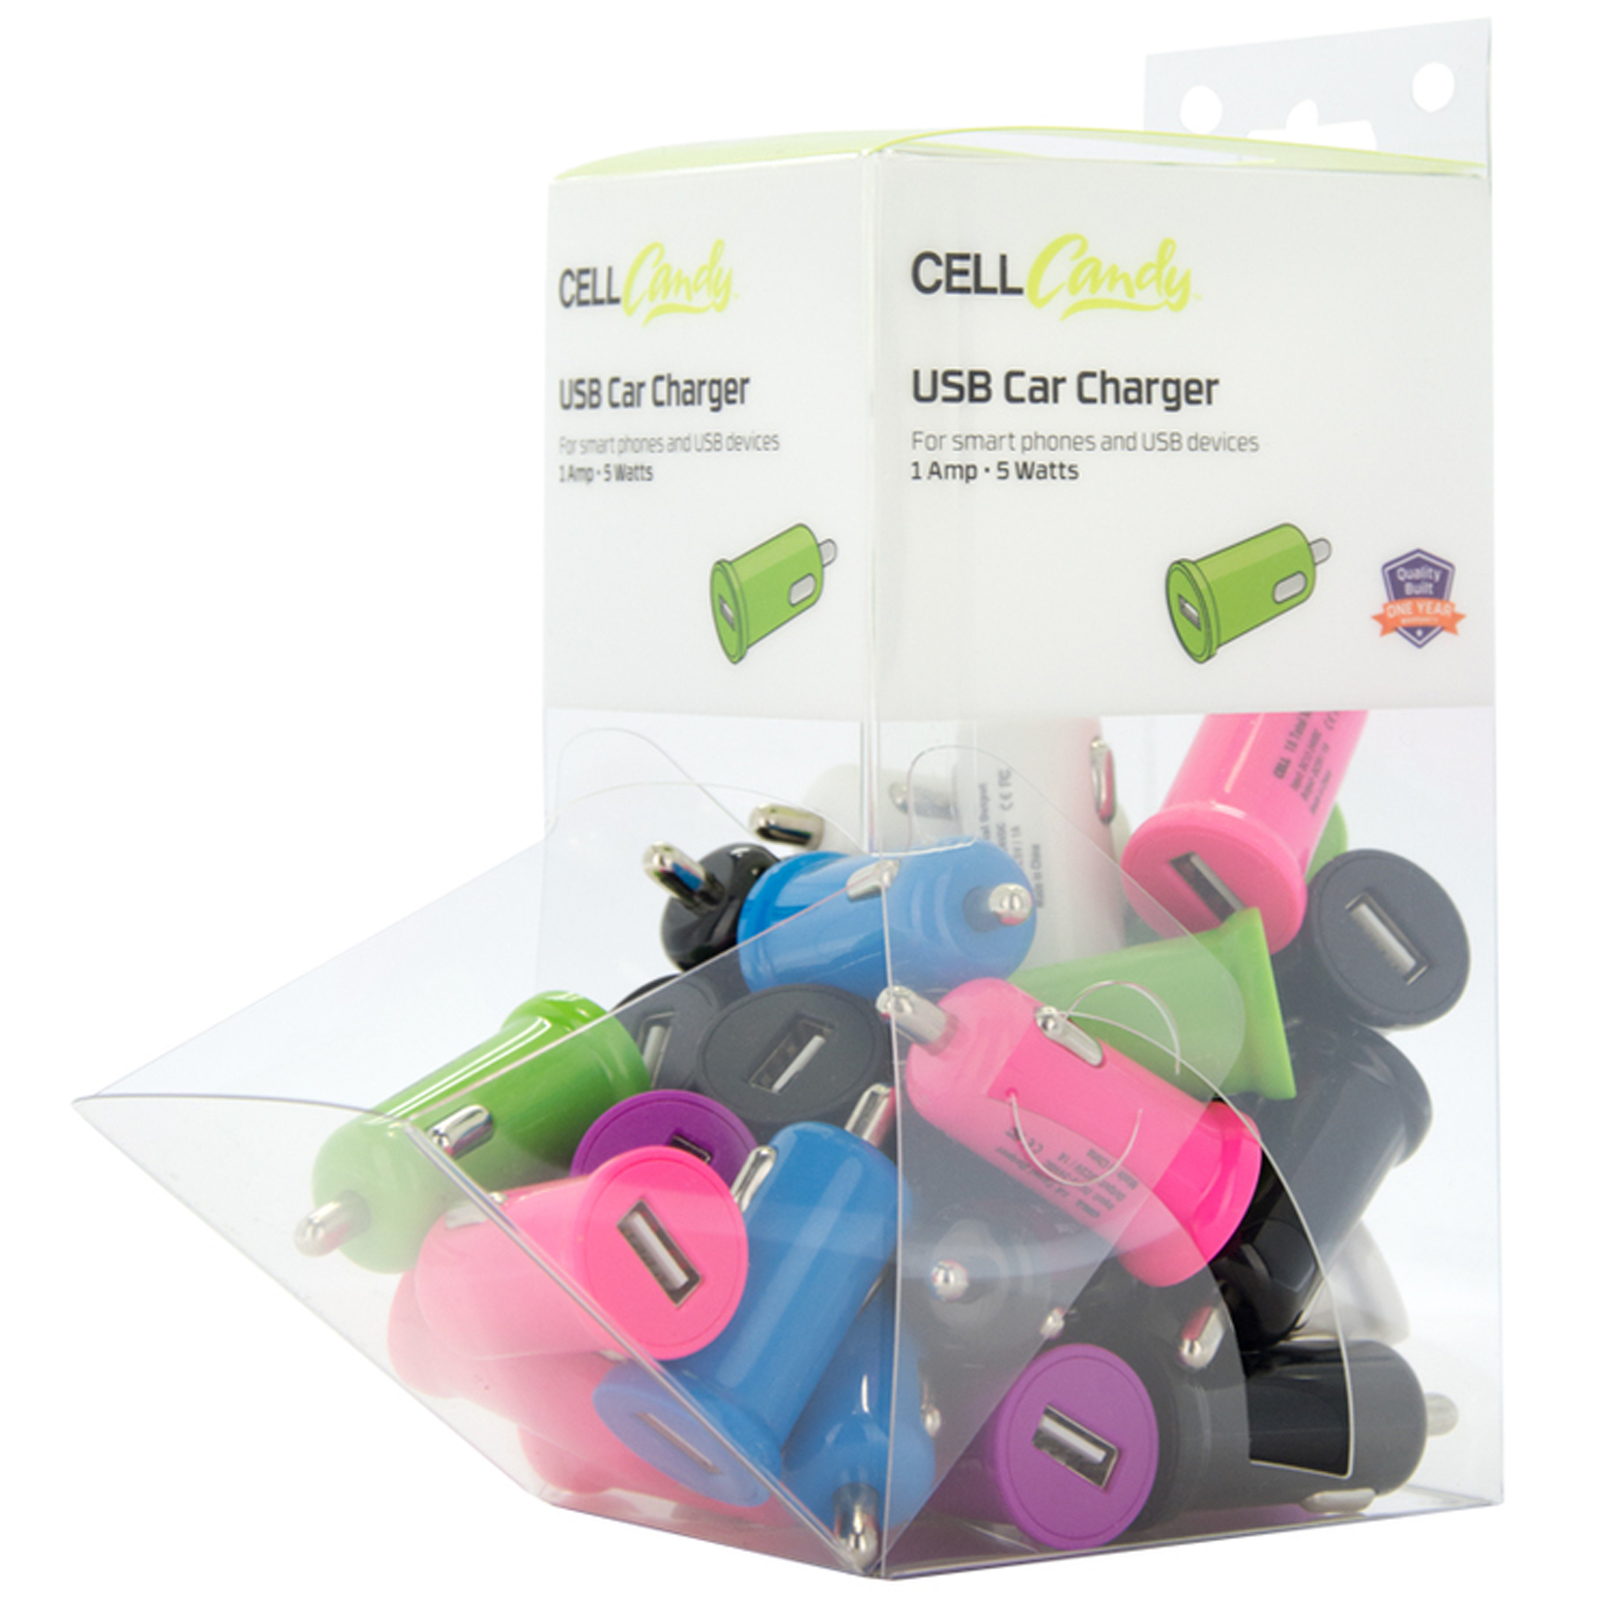 30 piece 1 Amp (5watt) USB Car Charger Bin